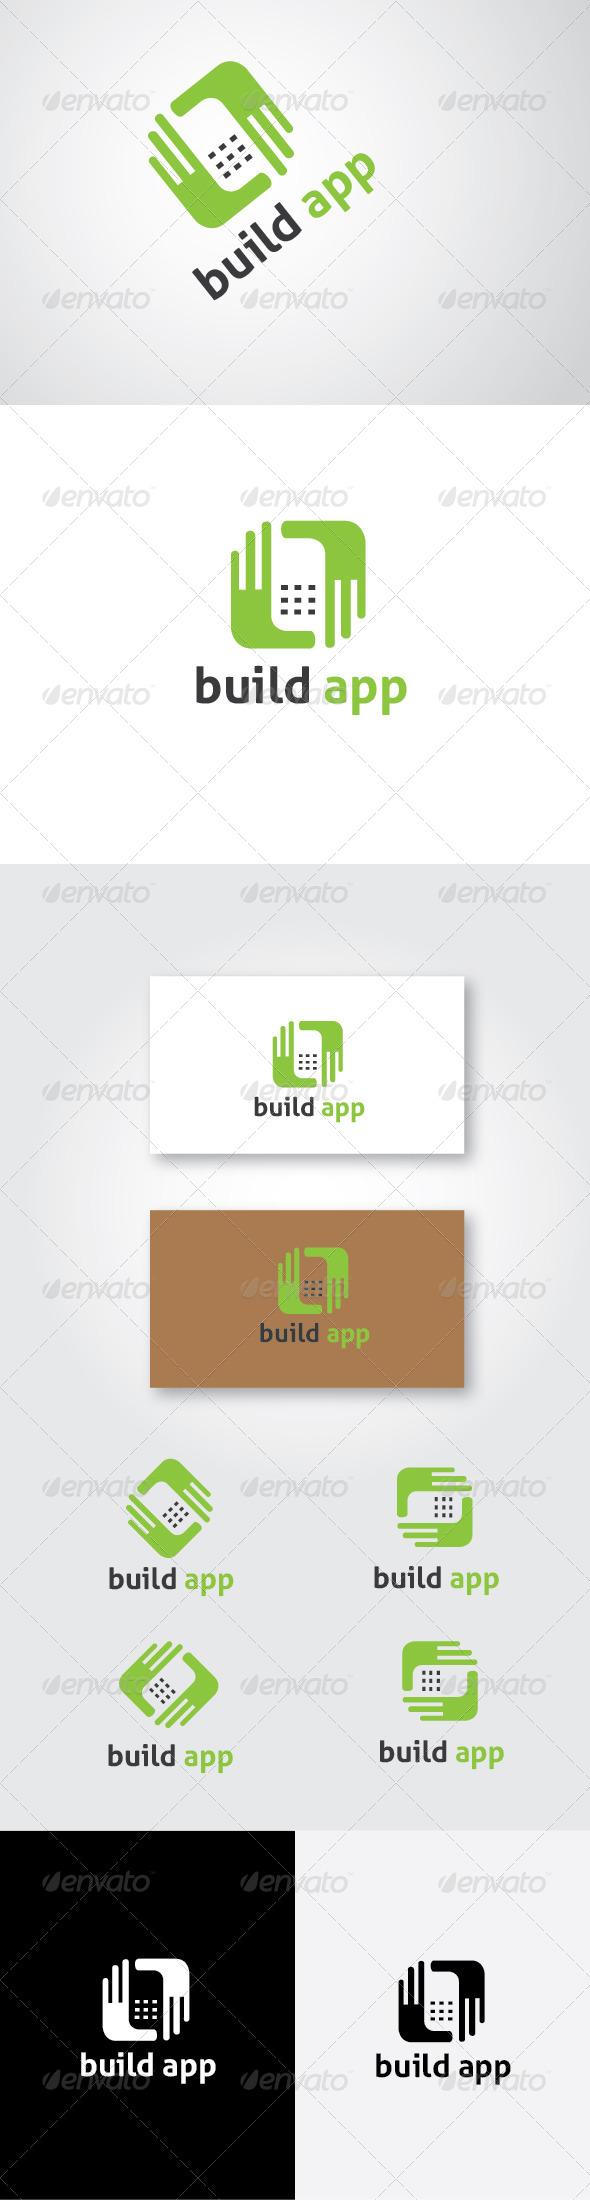 GraphicRiver Build App 5178147